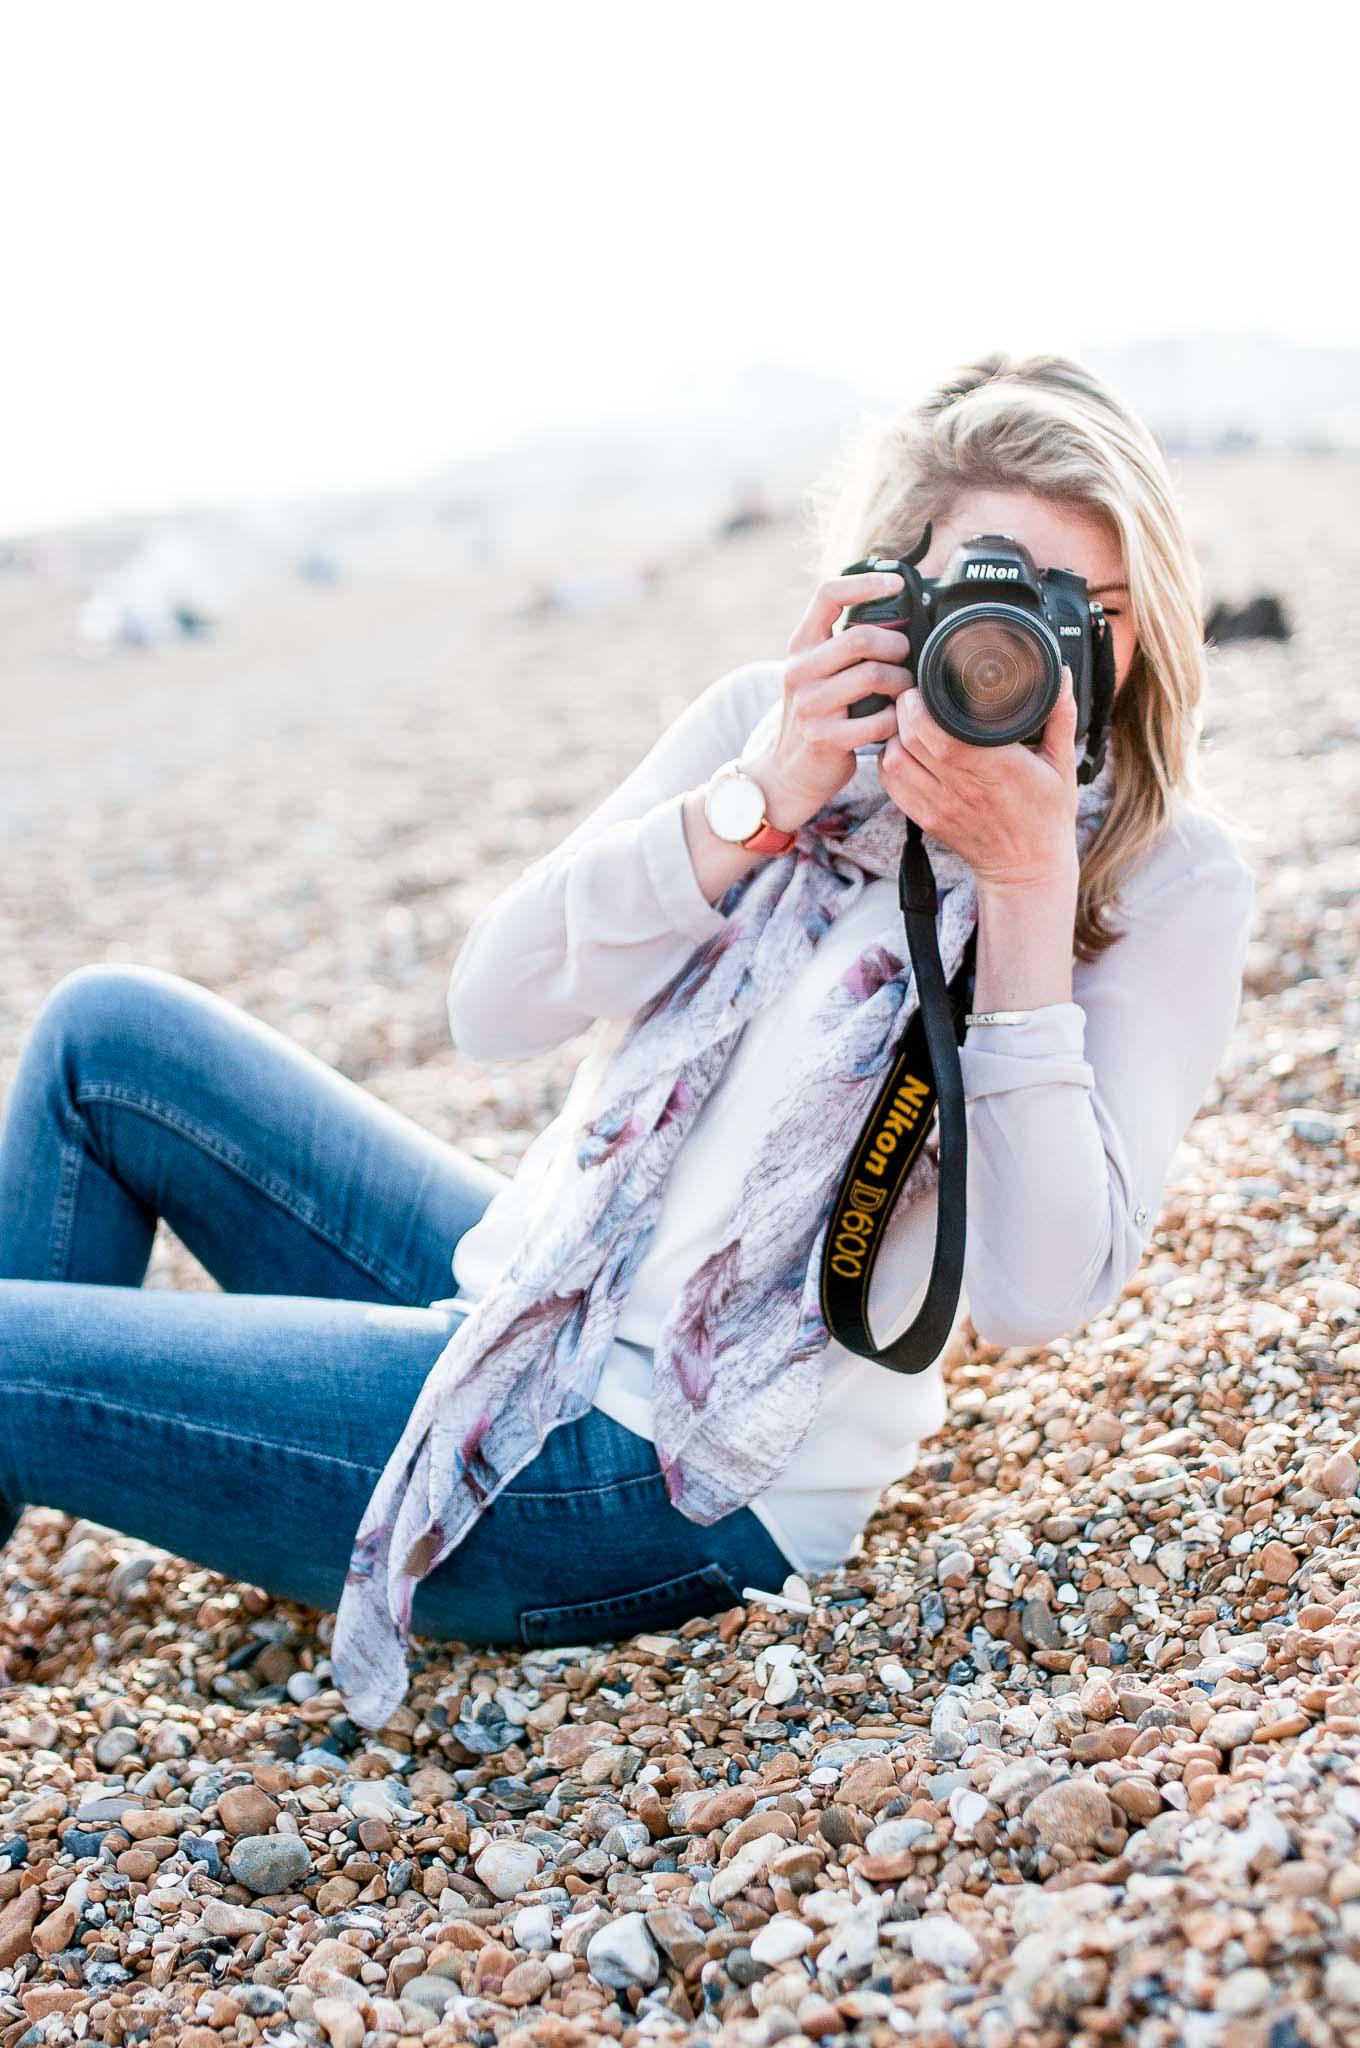 Brighton Portrait Photographer - Personal Brand Photography by Magdalena Smolarska